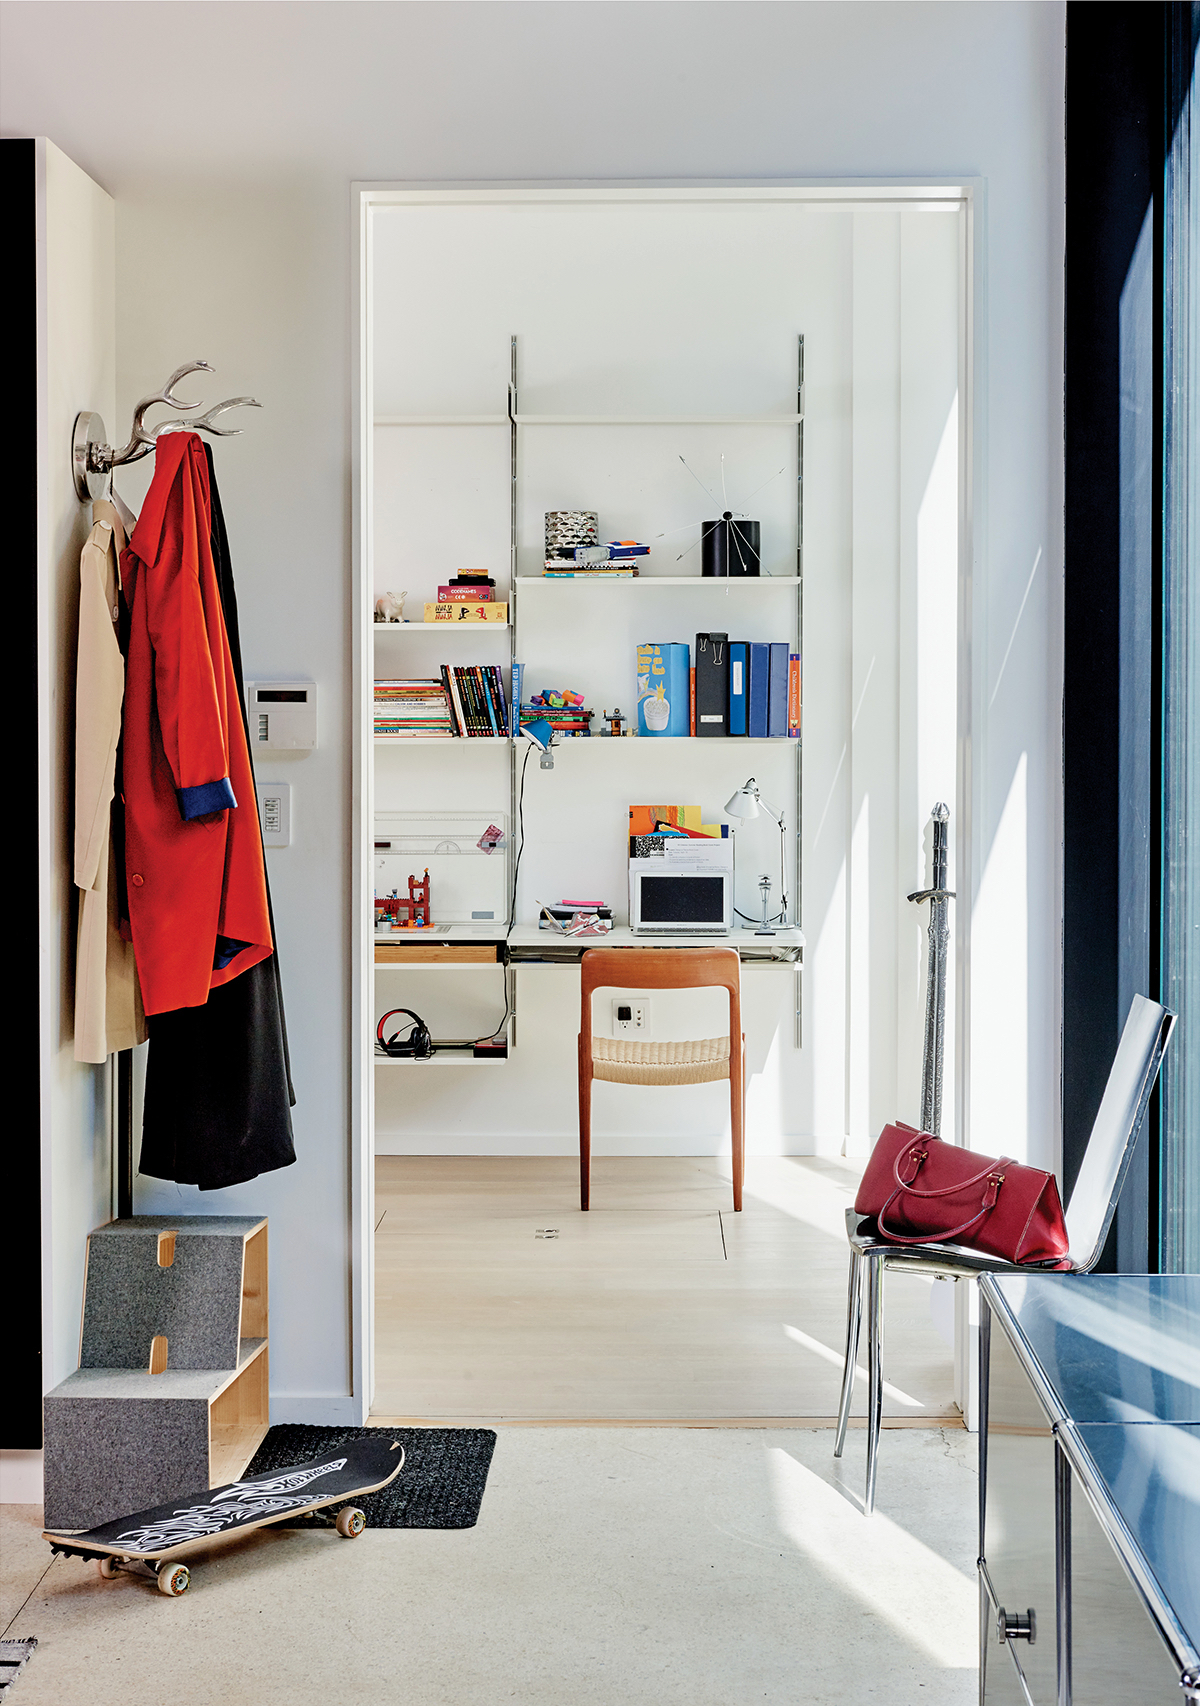 cambridge-midcentury-modern-home-renovation-5 2.jpg